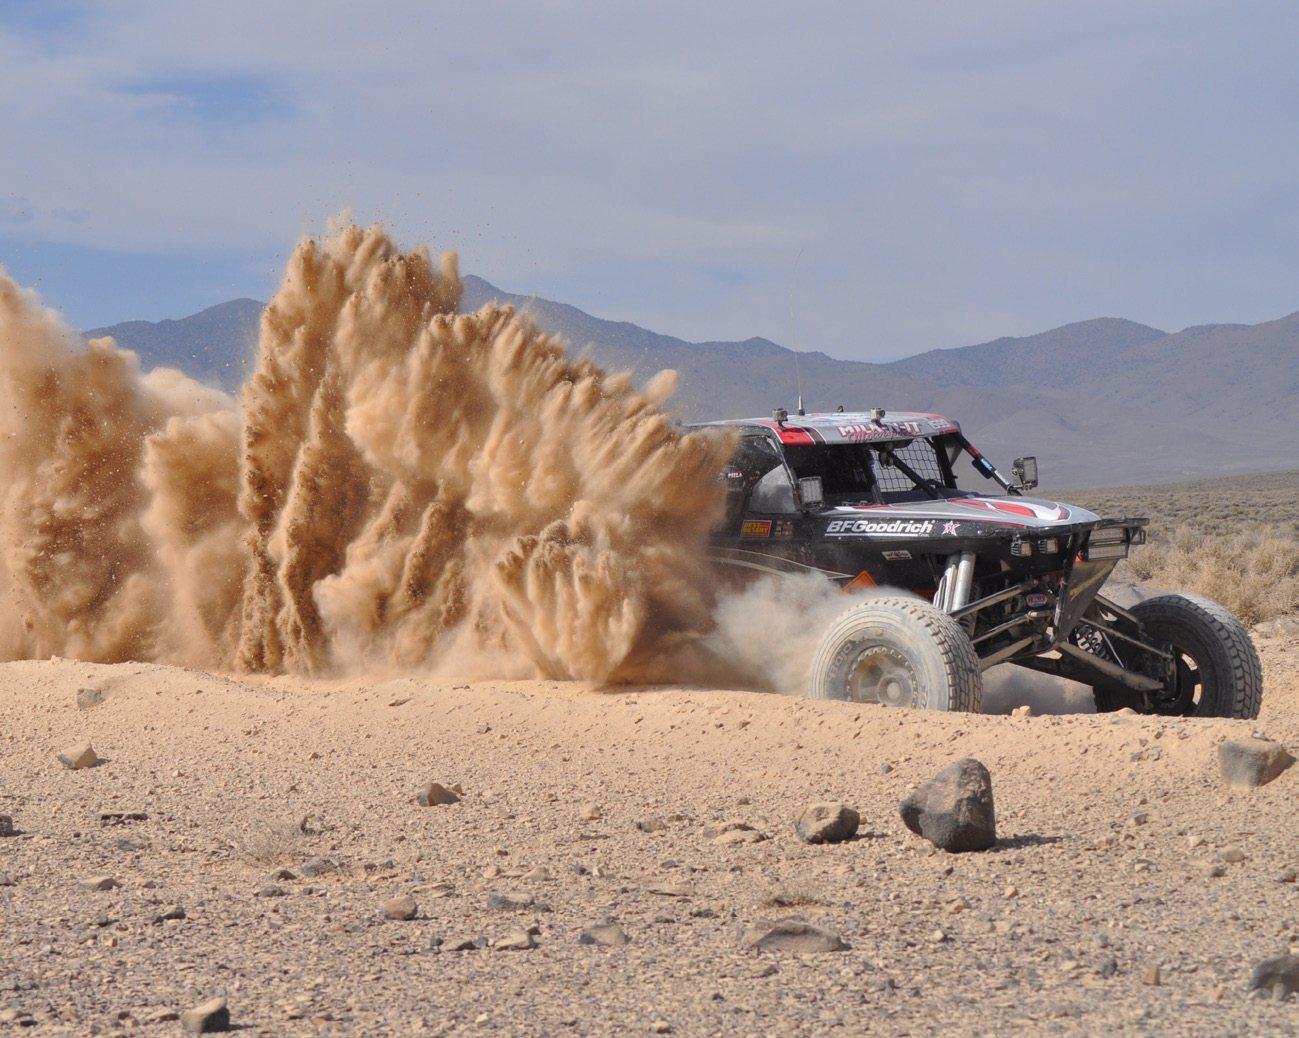 Vegas to Reno off-road race set to roar through county